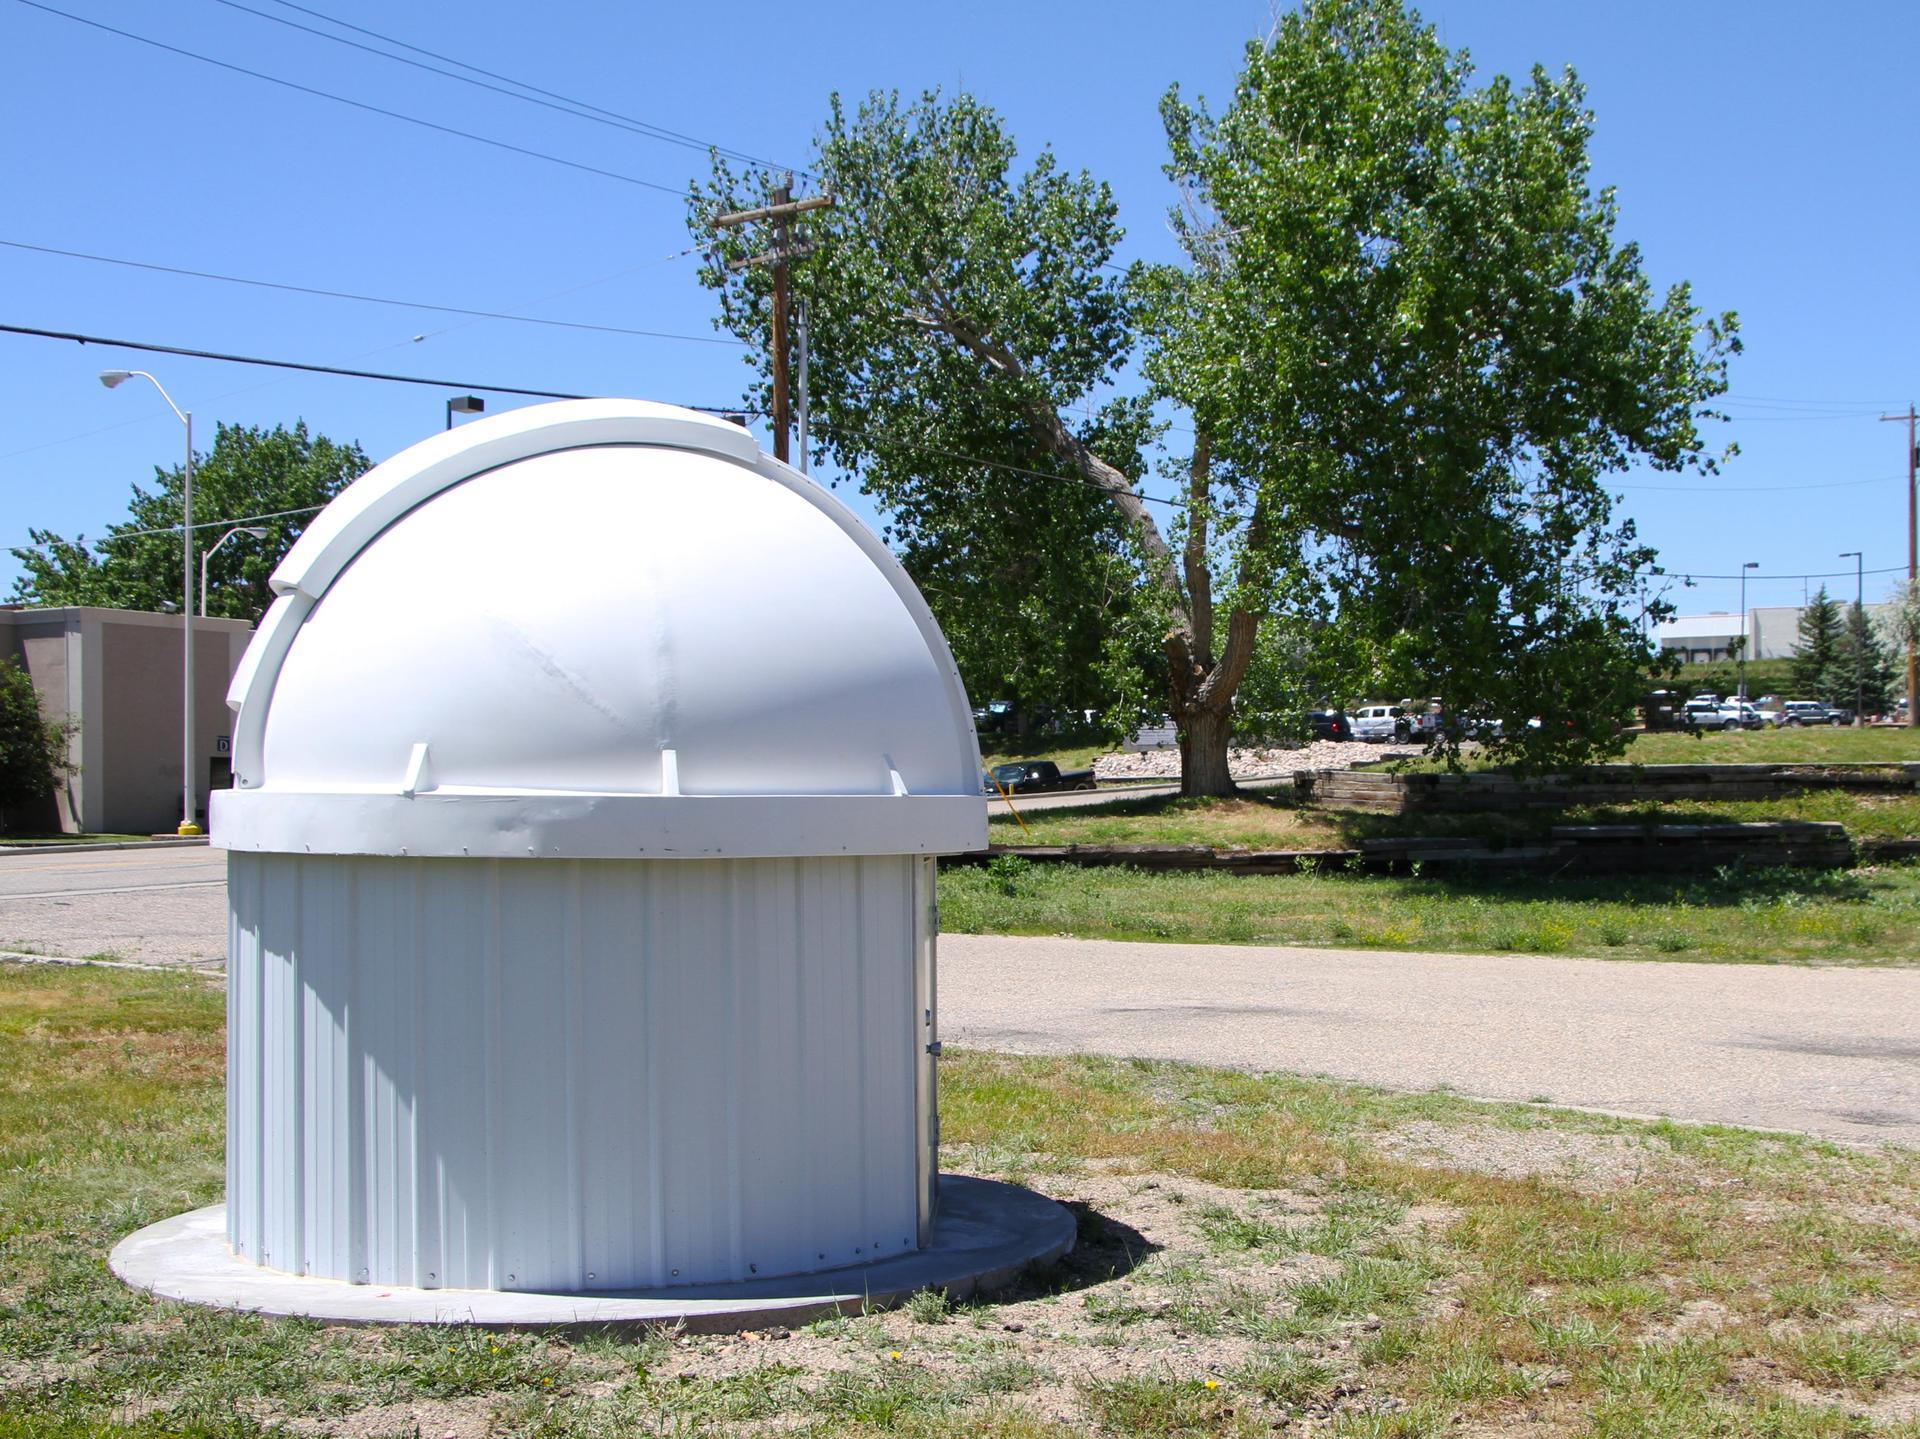 Planetarium Observation Dome